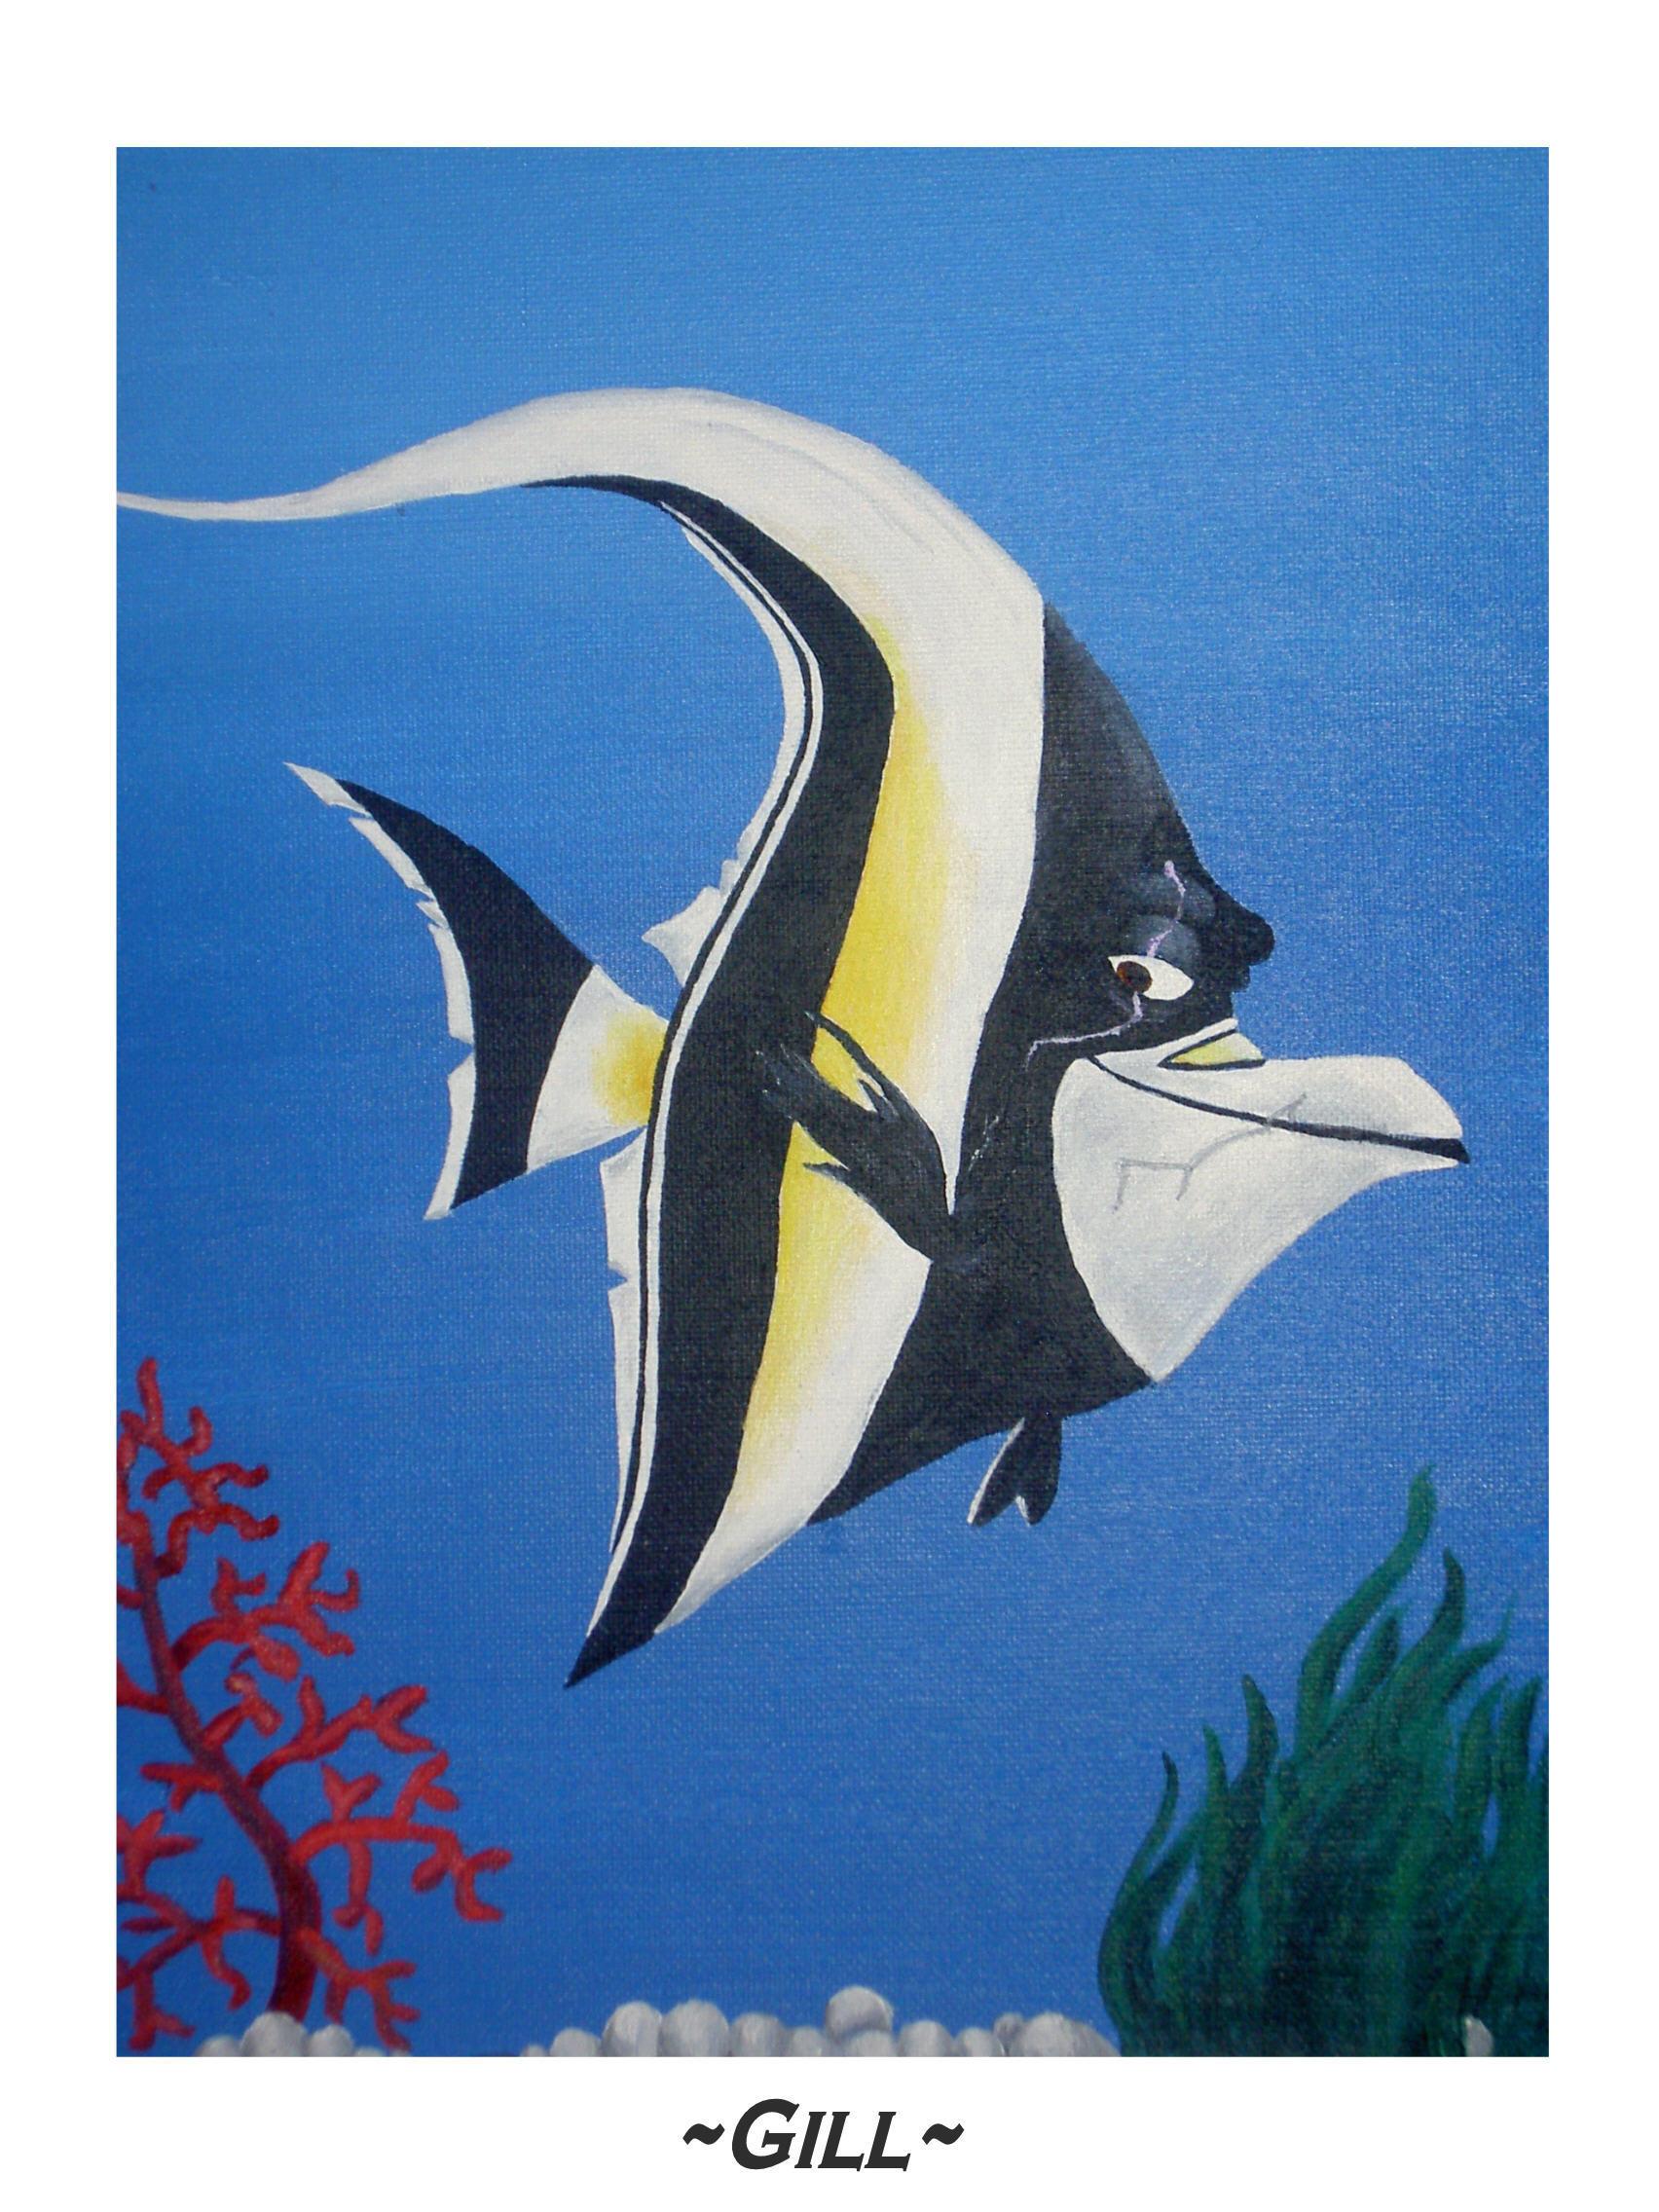 Finding Nemo WallpaperGill From Finding Nemo